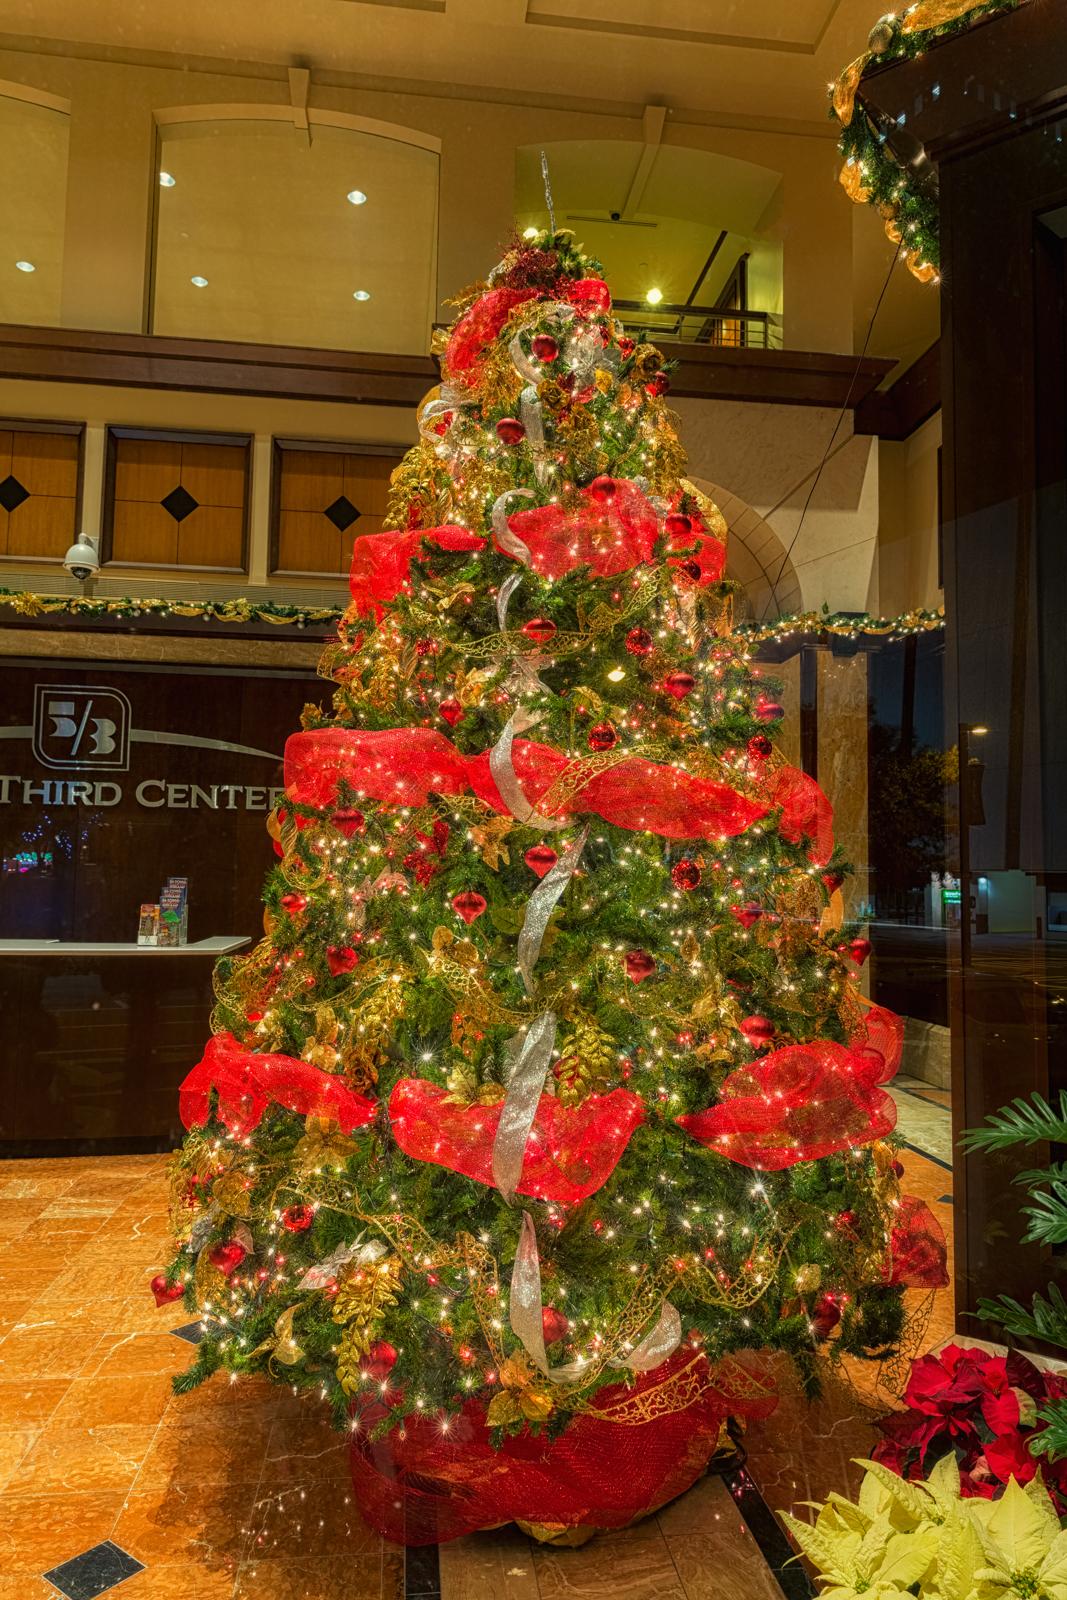 Florida christmas ornament - Fifth Third Center Christmas Tree Tampa Florida